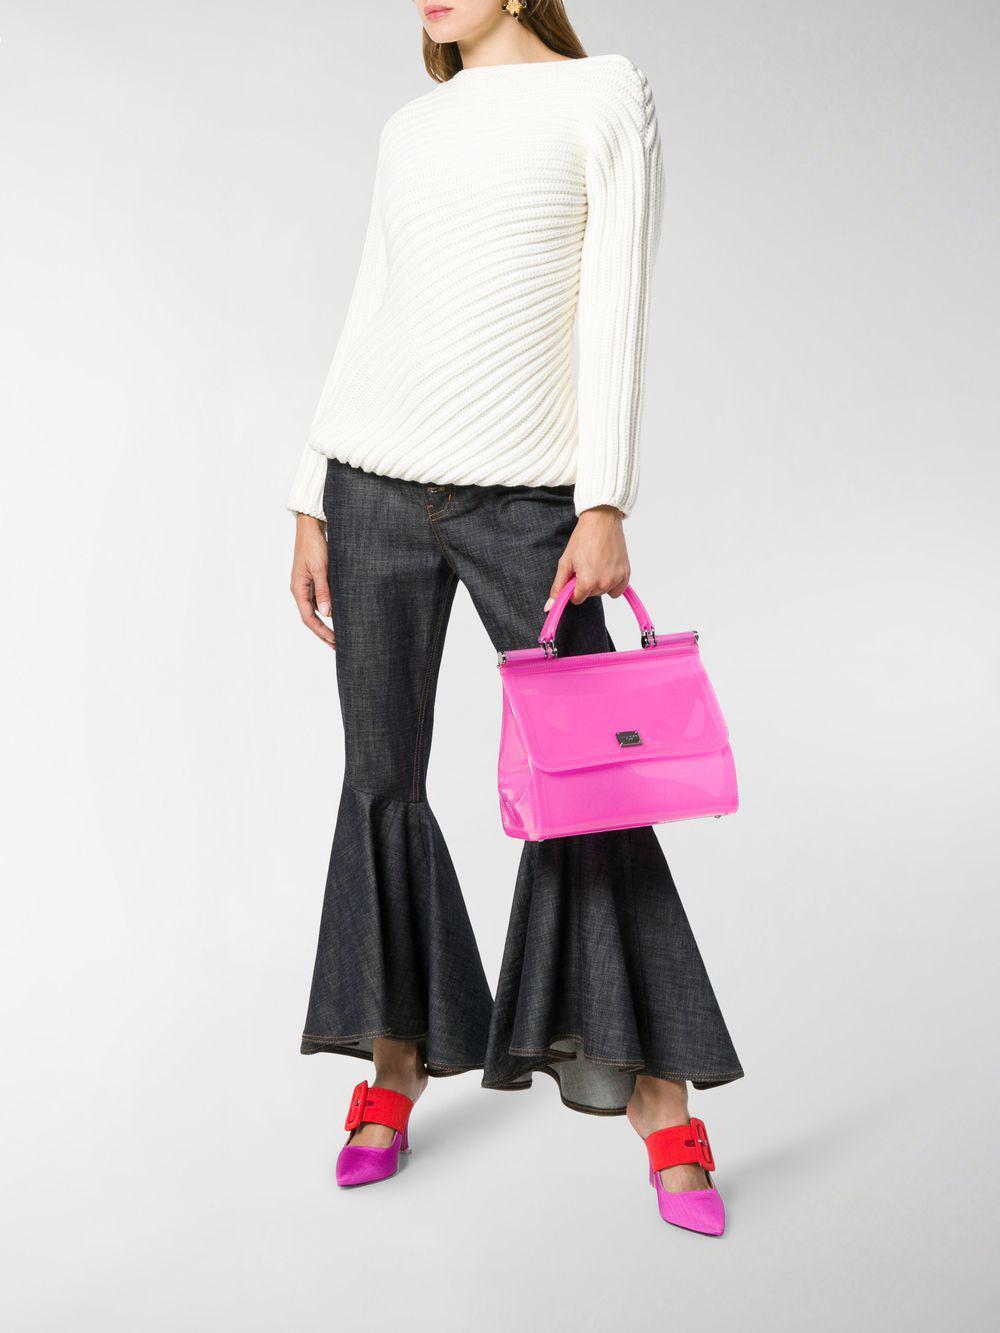 aa671a1f83d8 Dolce   Gabbana - Pink Sicily Transparent Pvc Shoulder Bag - Lyst. View  fullscreen